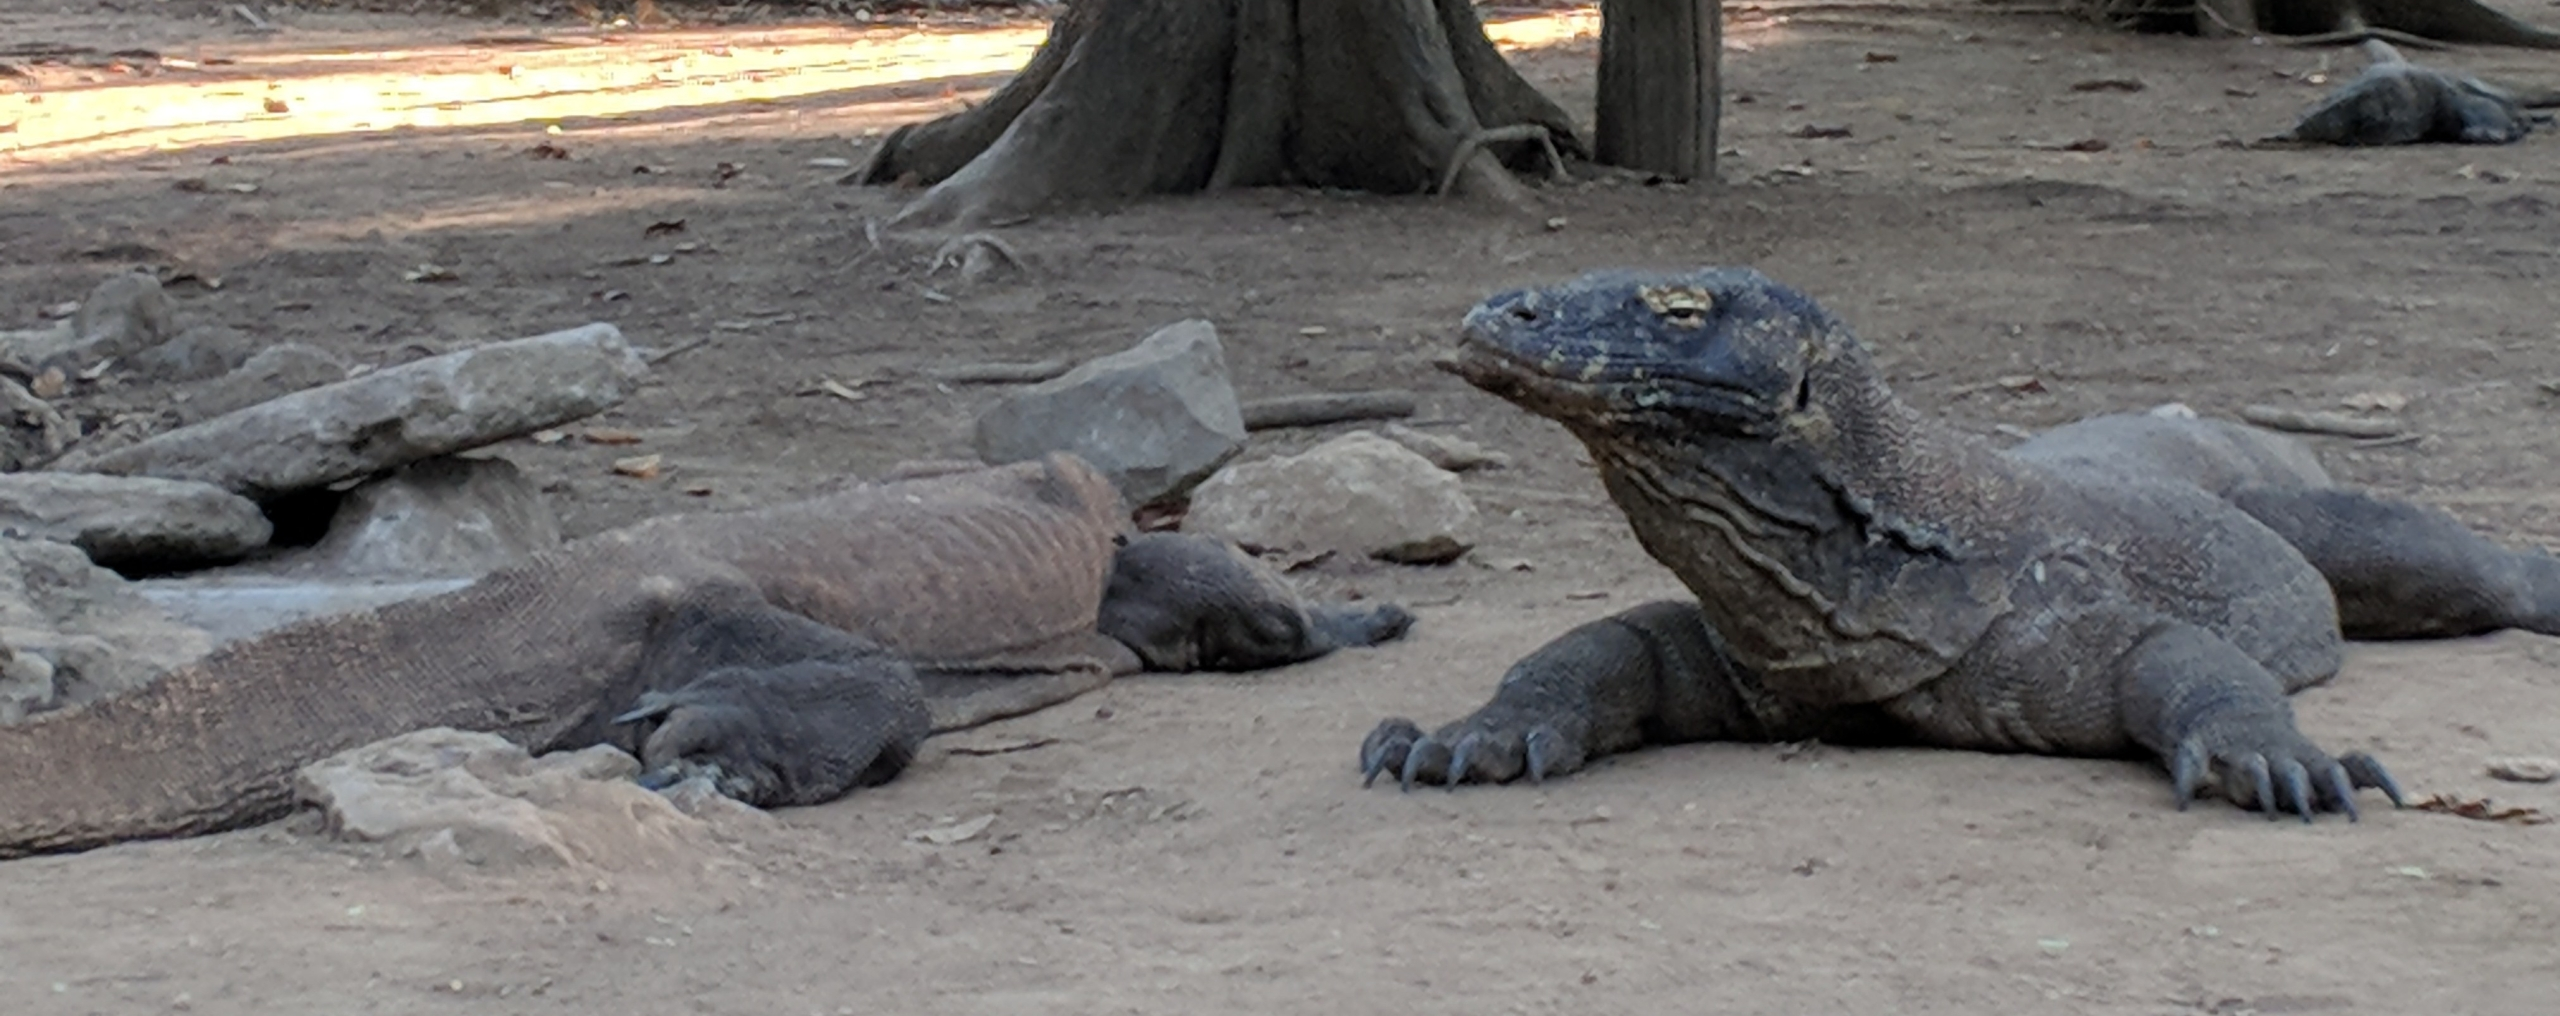 komodo national park, komodo dragon, Indonesia, Komodo Island